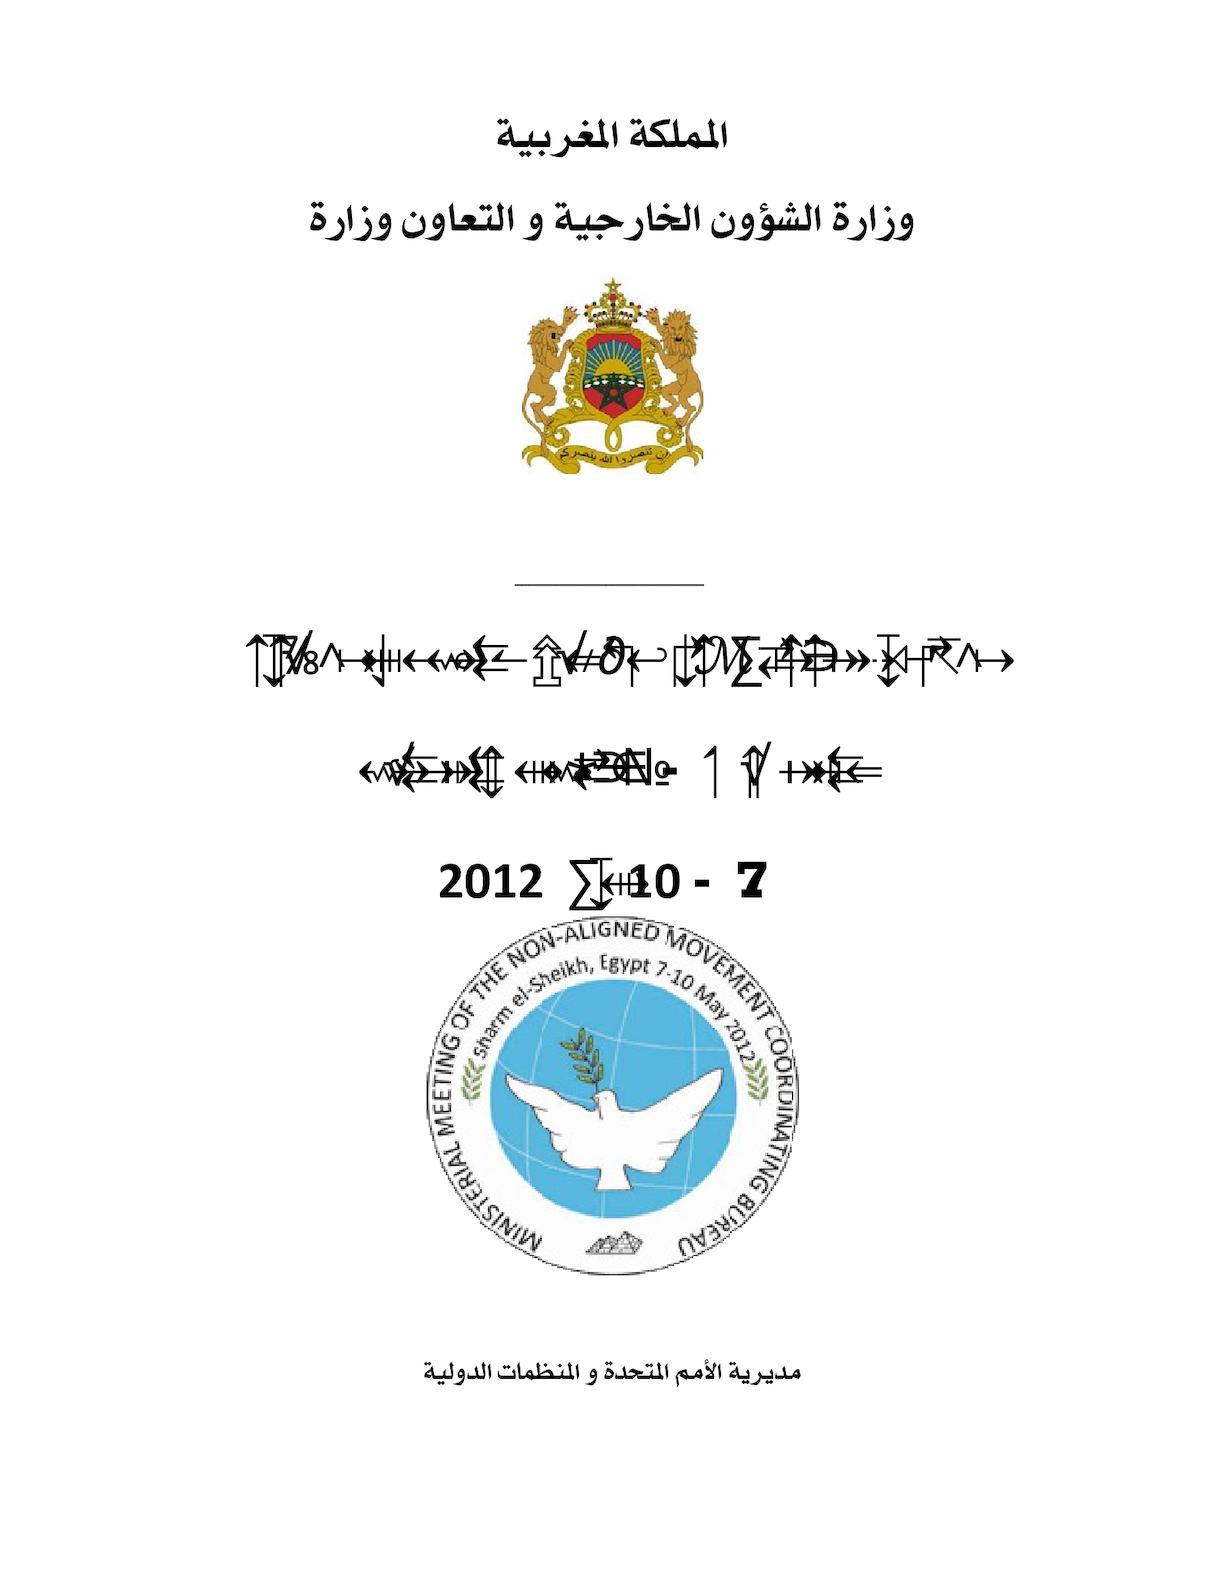 REUNION MINISTERIELLE SHARM ELSHEIKH 2012 RECUEIL EN ARABE FINAL